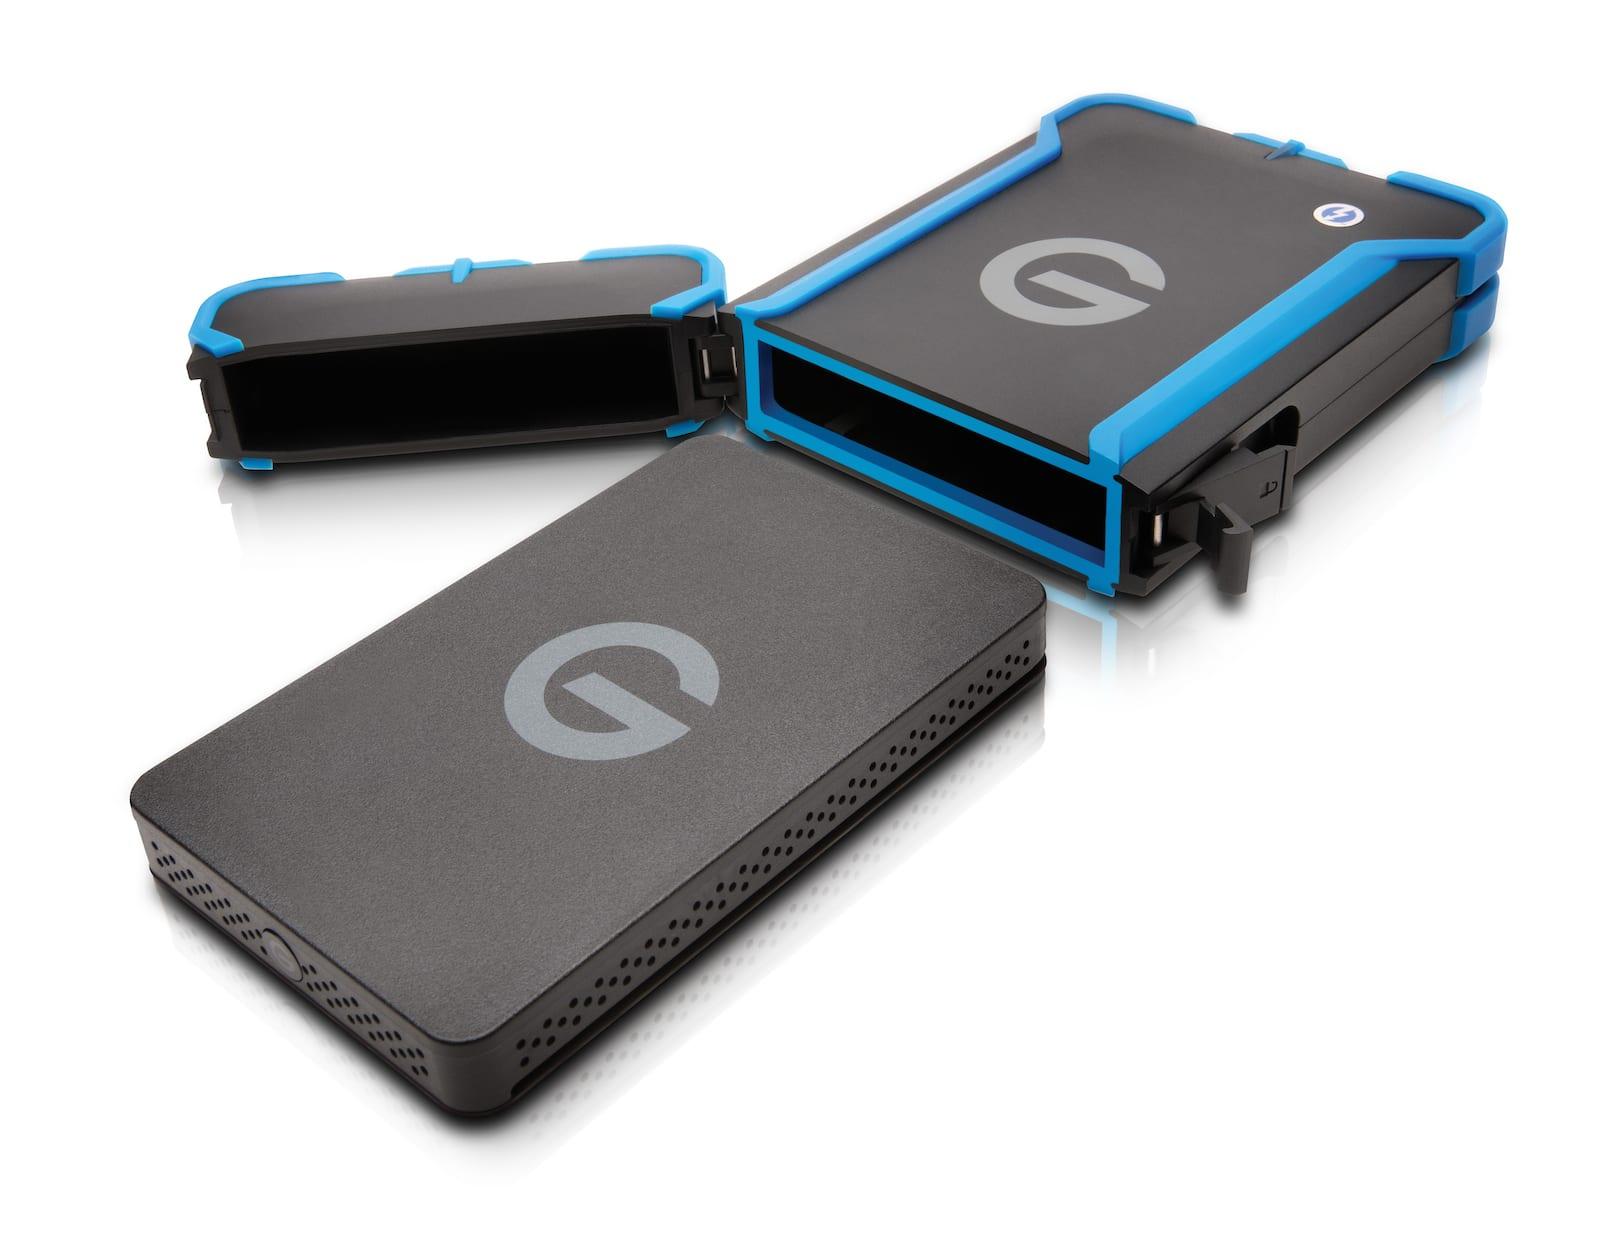 G-Technology G-DRIVE ATC Thunderbolt USB3.0 1TB